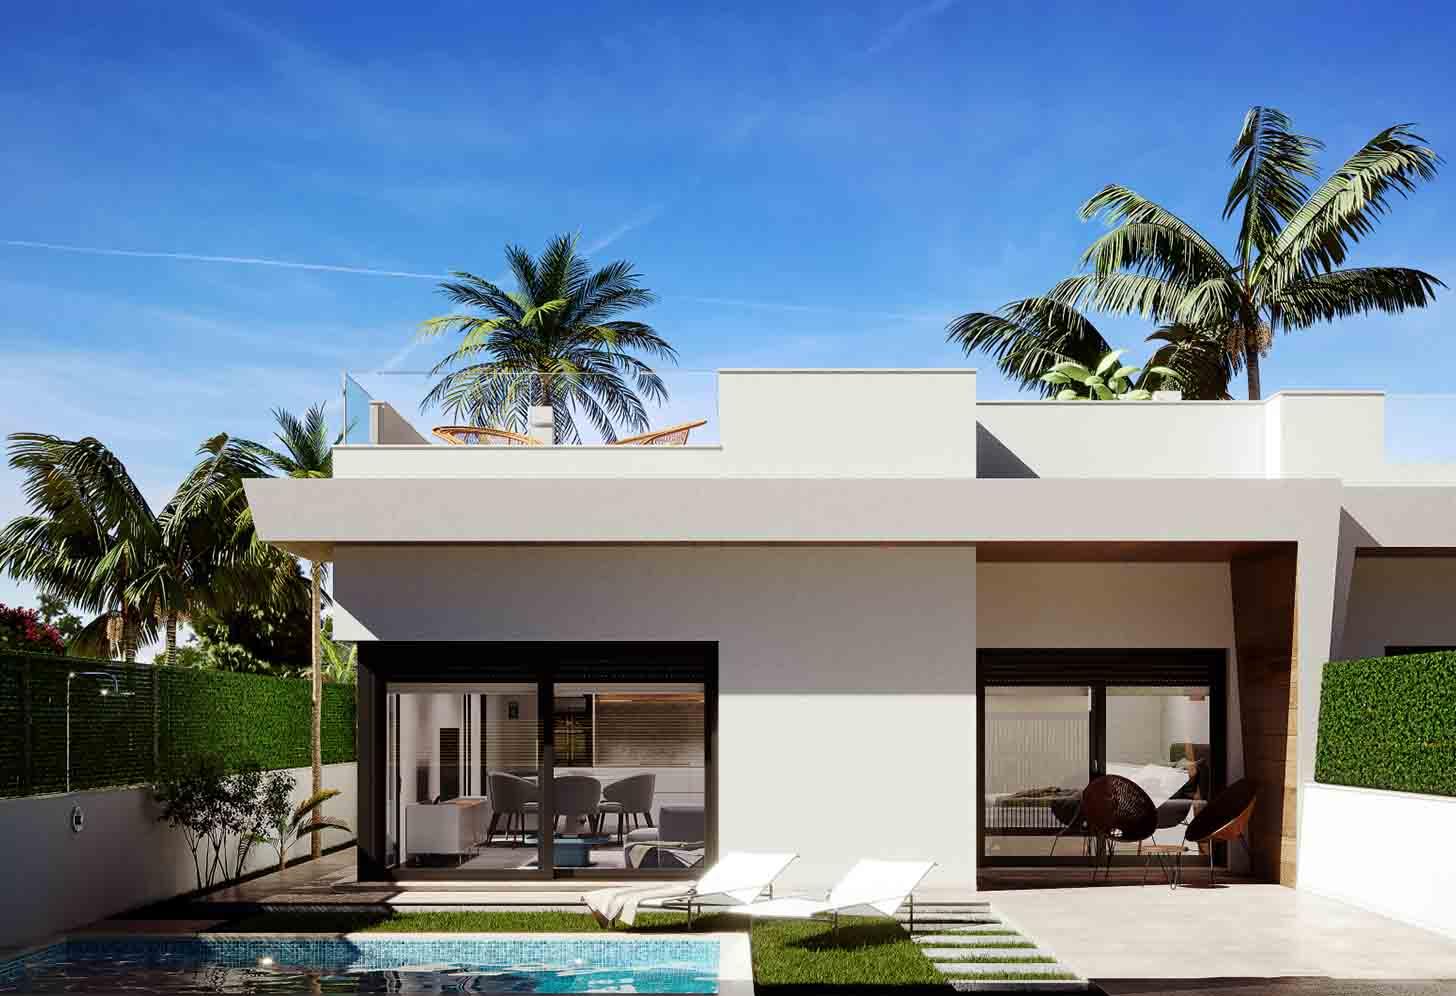 immobilier neuf espagne costa blanca on-d15 palmeral roda golf piscine